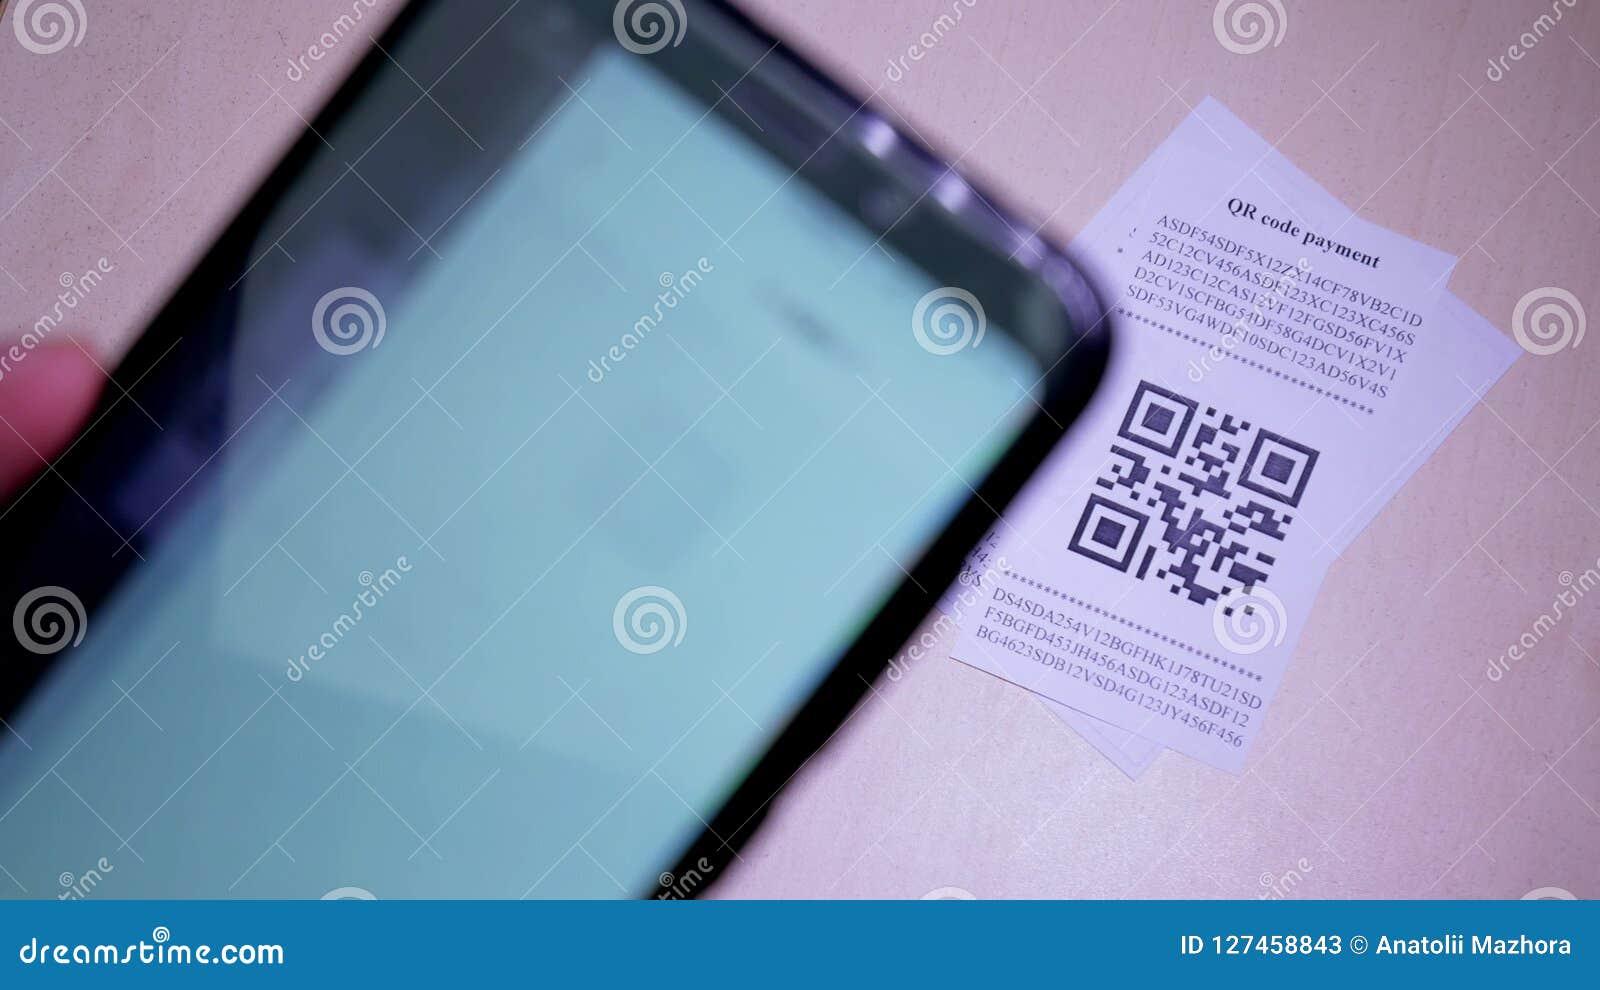 Smart phone scanning QR code in paper label